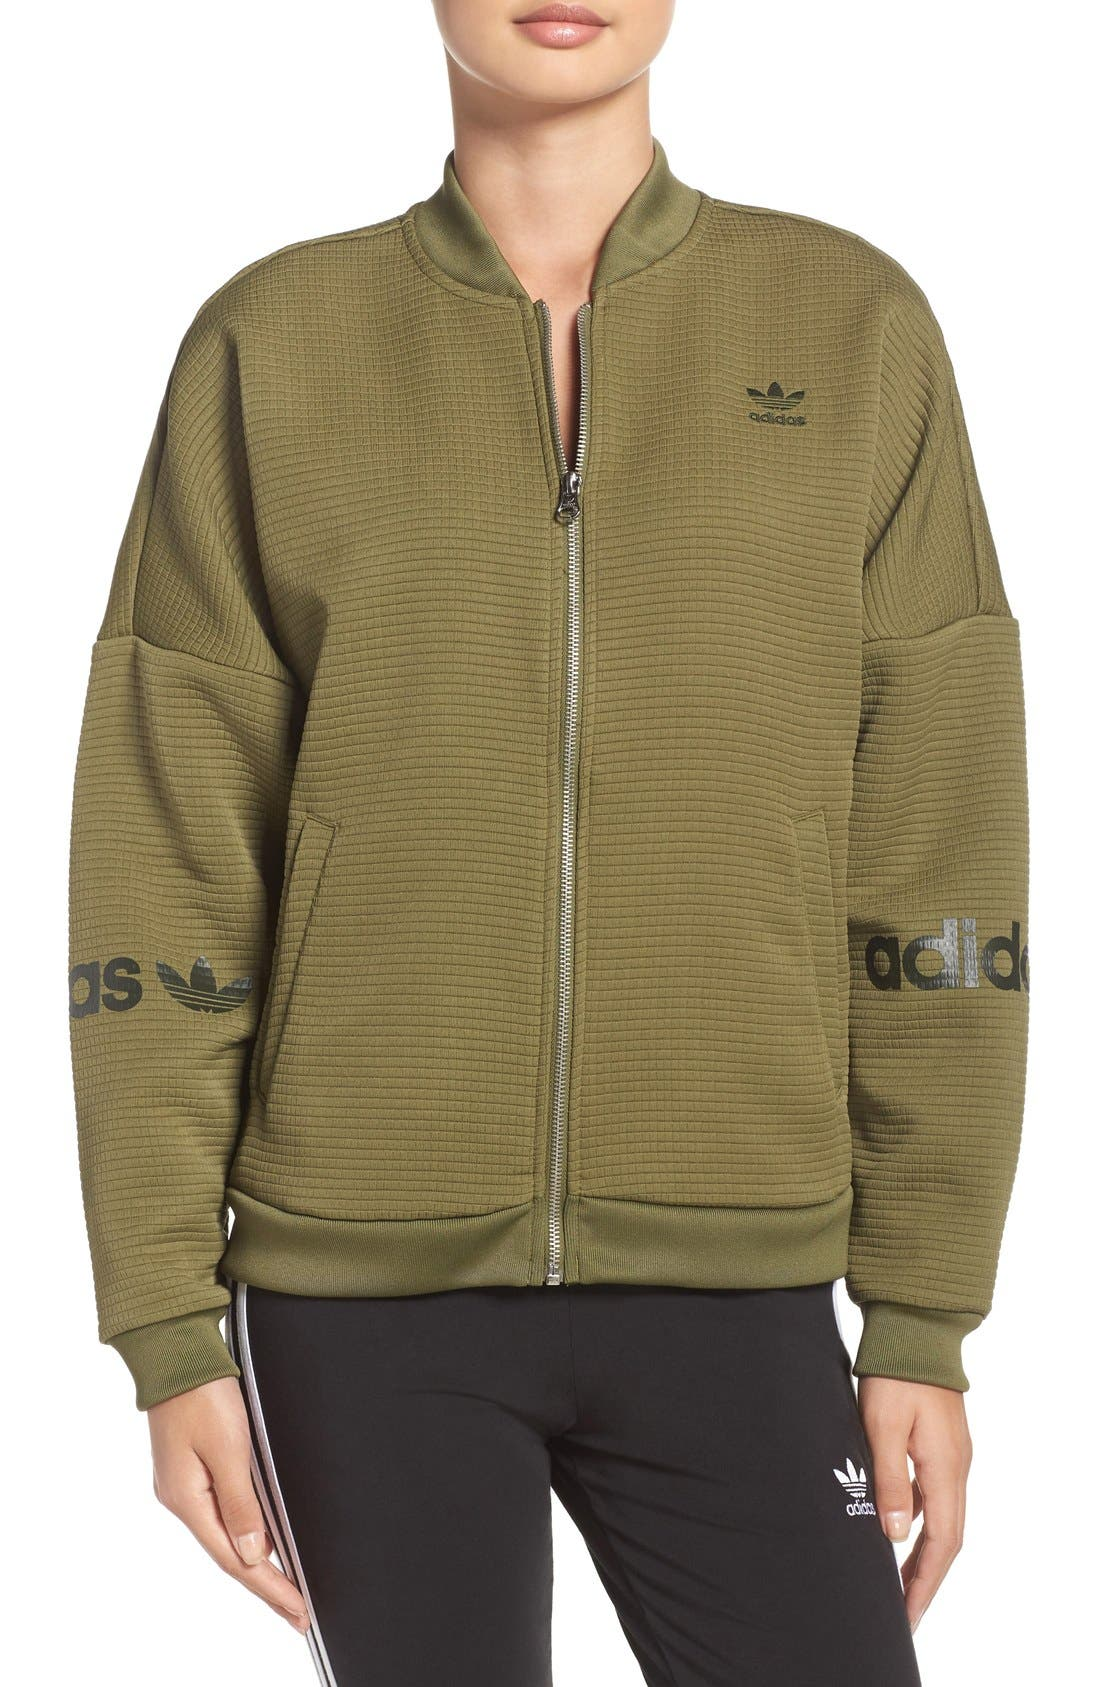 Alternate Image 1 Selected - adidas Originals 3-Stripes Bomber Jacket